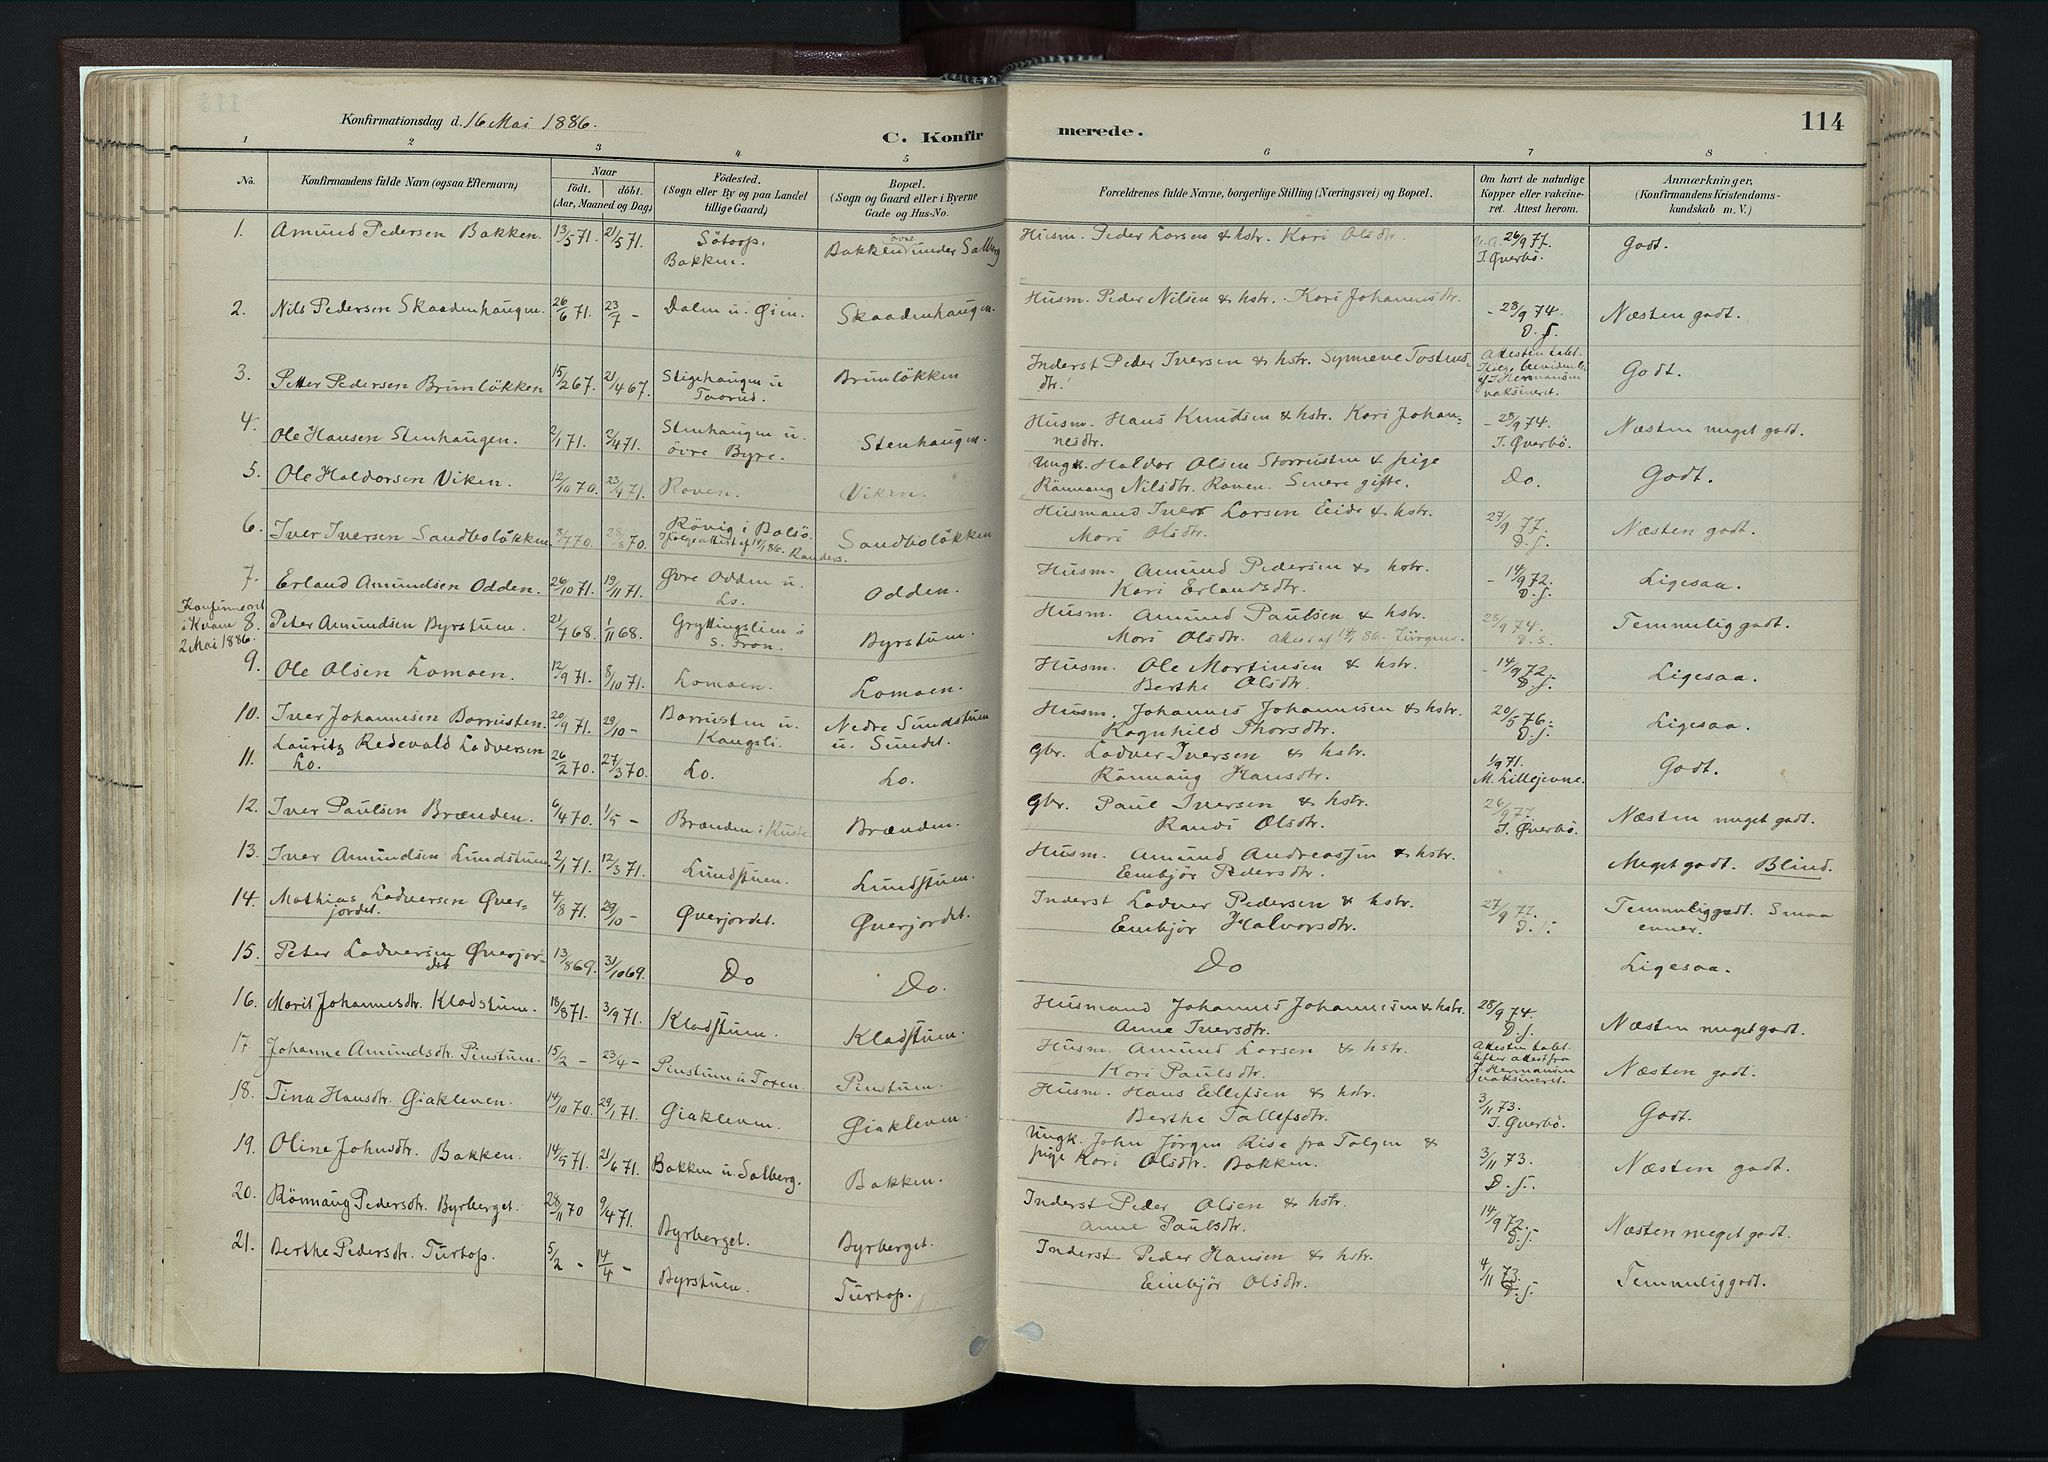 SAH, Nord-Fron prestekontor, Ministerialbok nr. 4, 1884-1914, s. 114